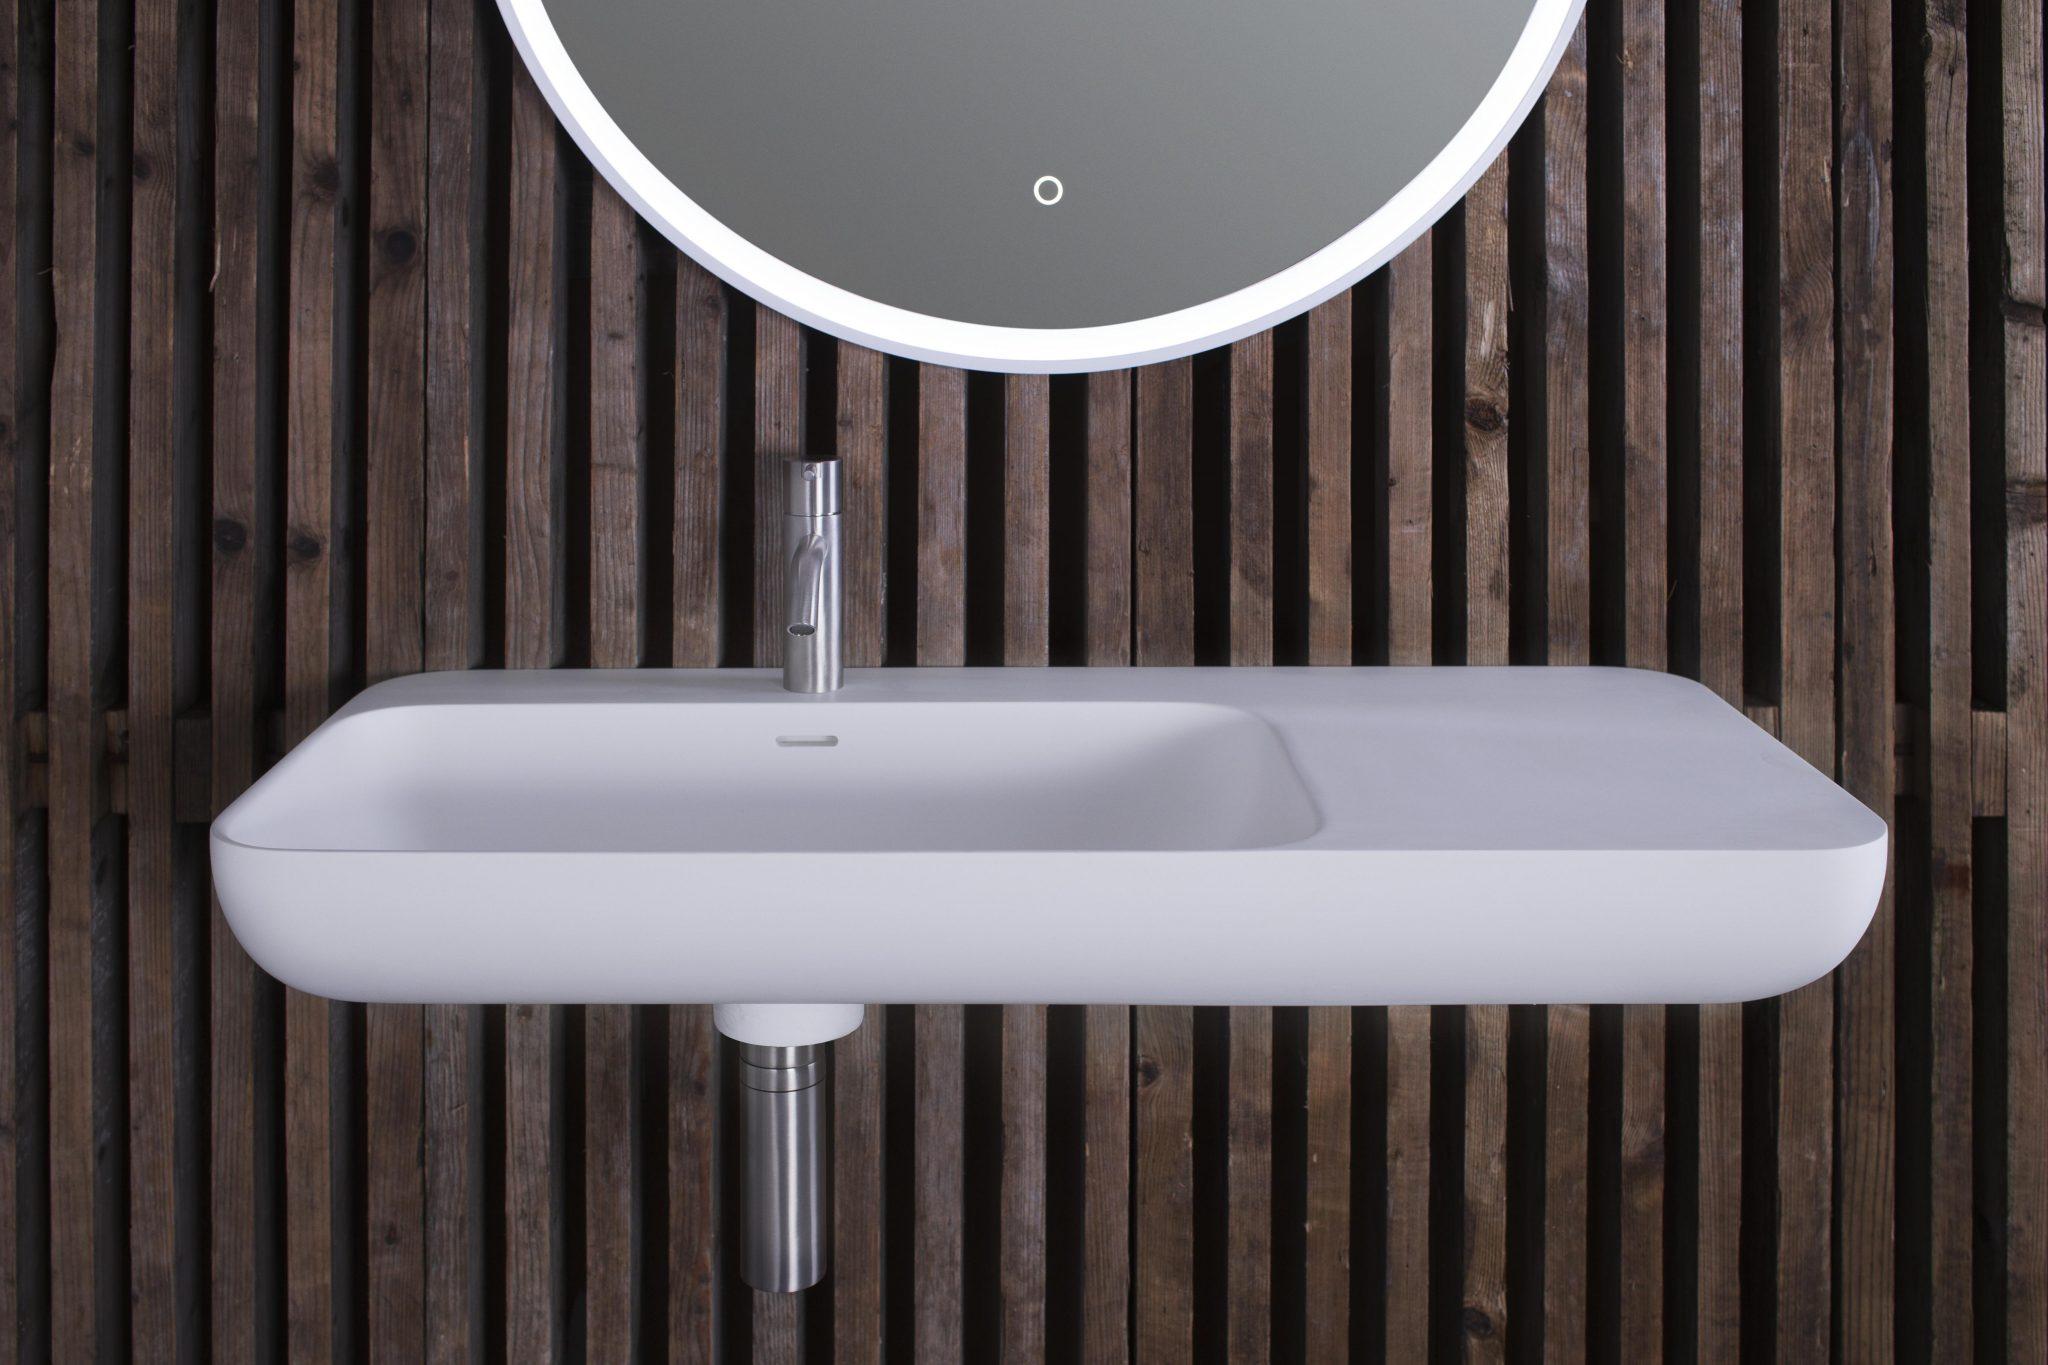 en-90-wash-basin-from-copenhagen-bath_27314434046_o